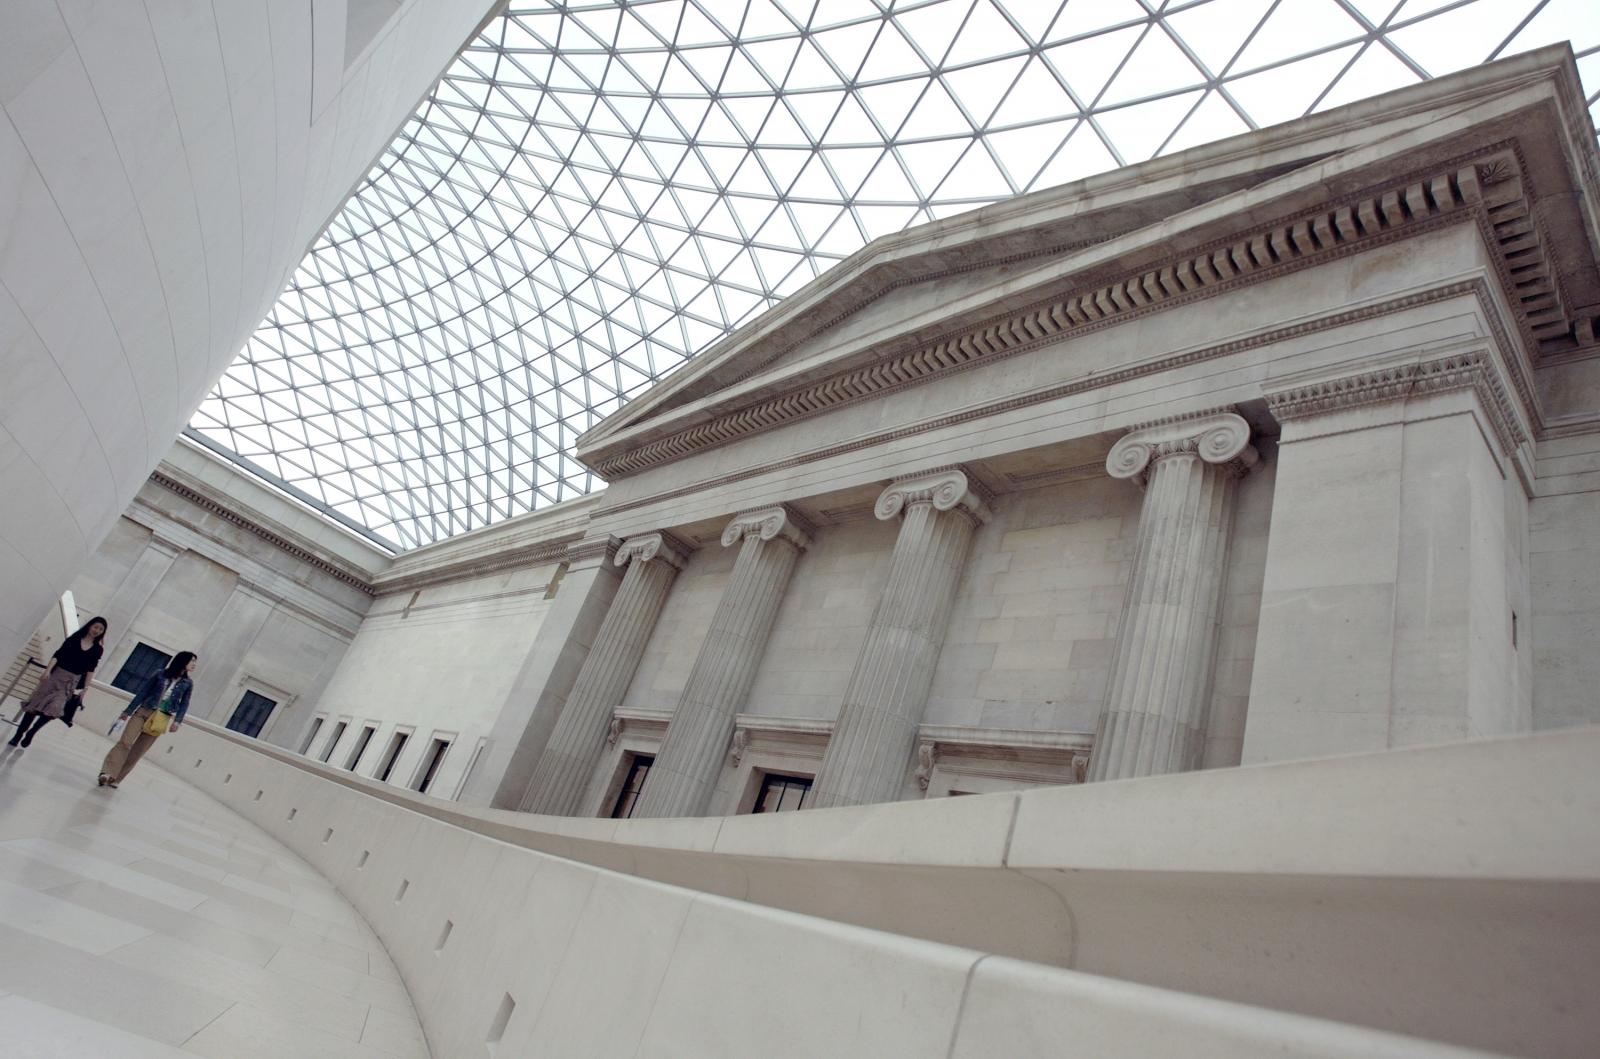 British Museum, England